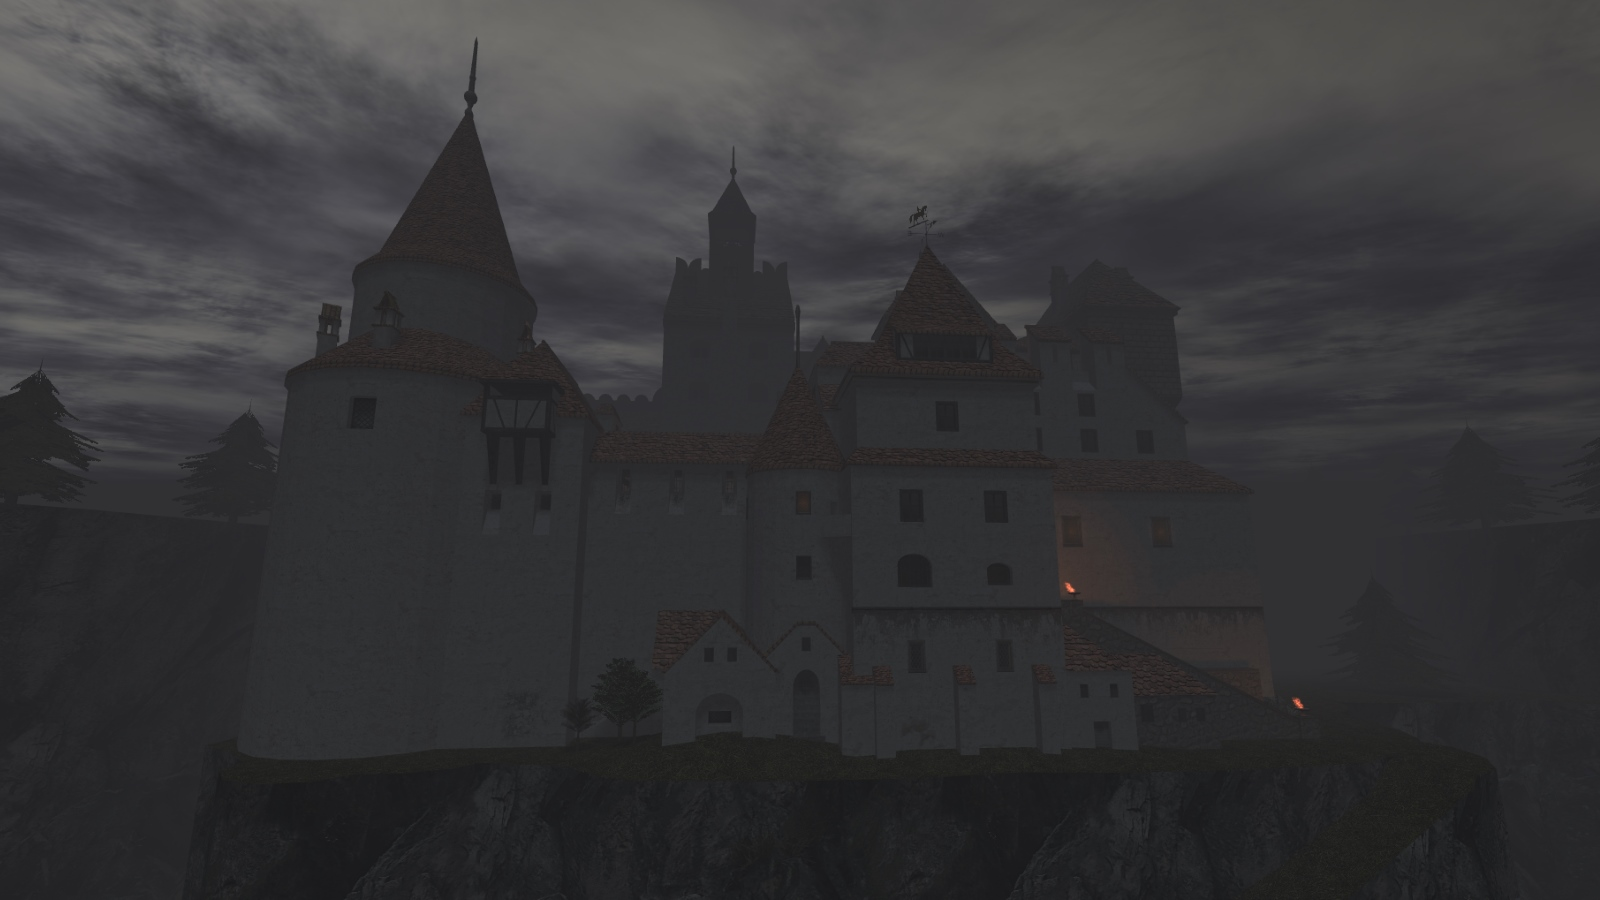 Castle Dracula in Thief 2 fan-mission Nosferatu